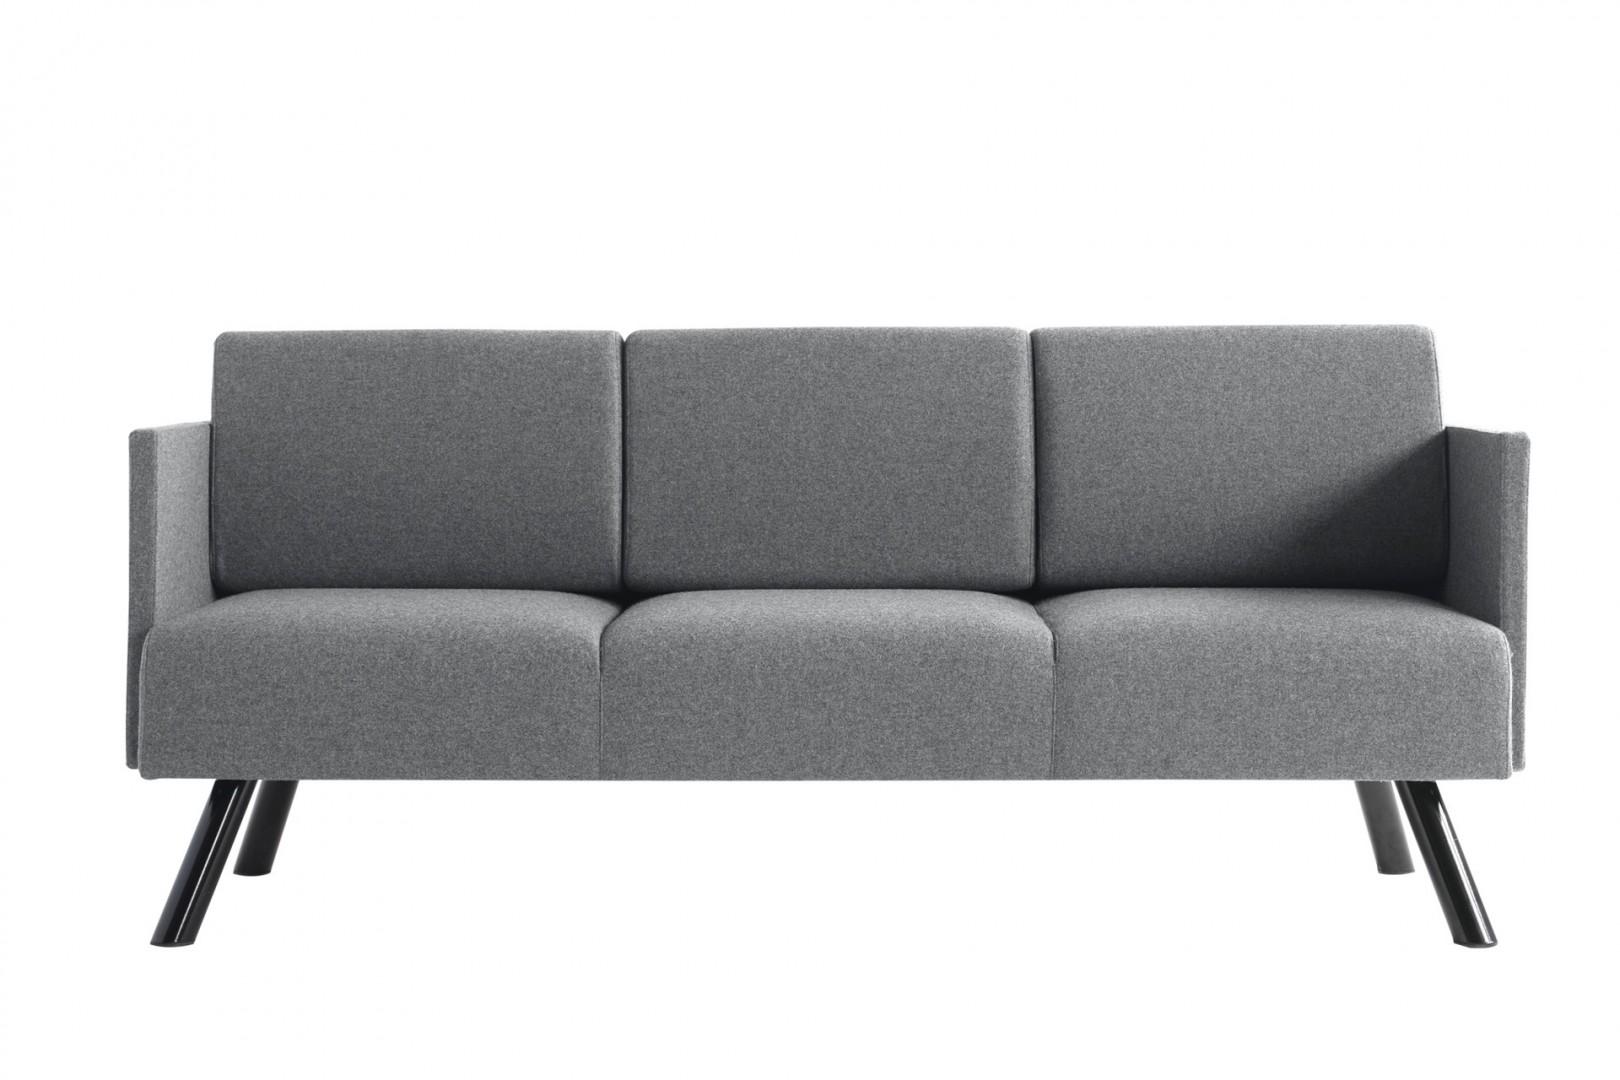 Sofa biurowa tapicerowana Nomad Metalmobil